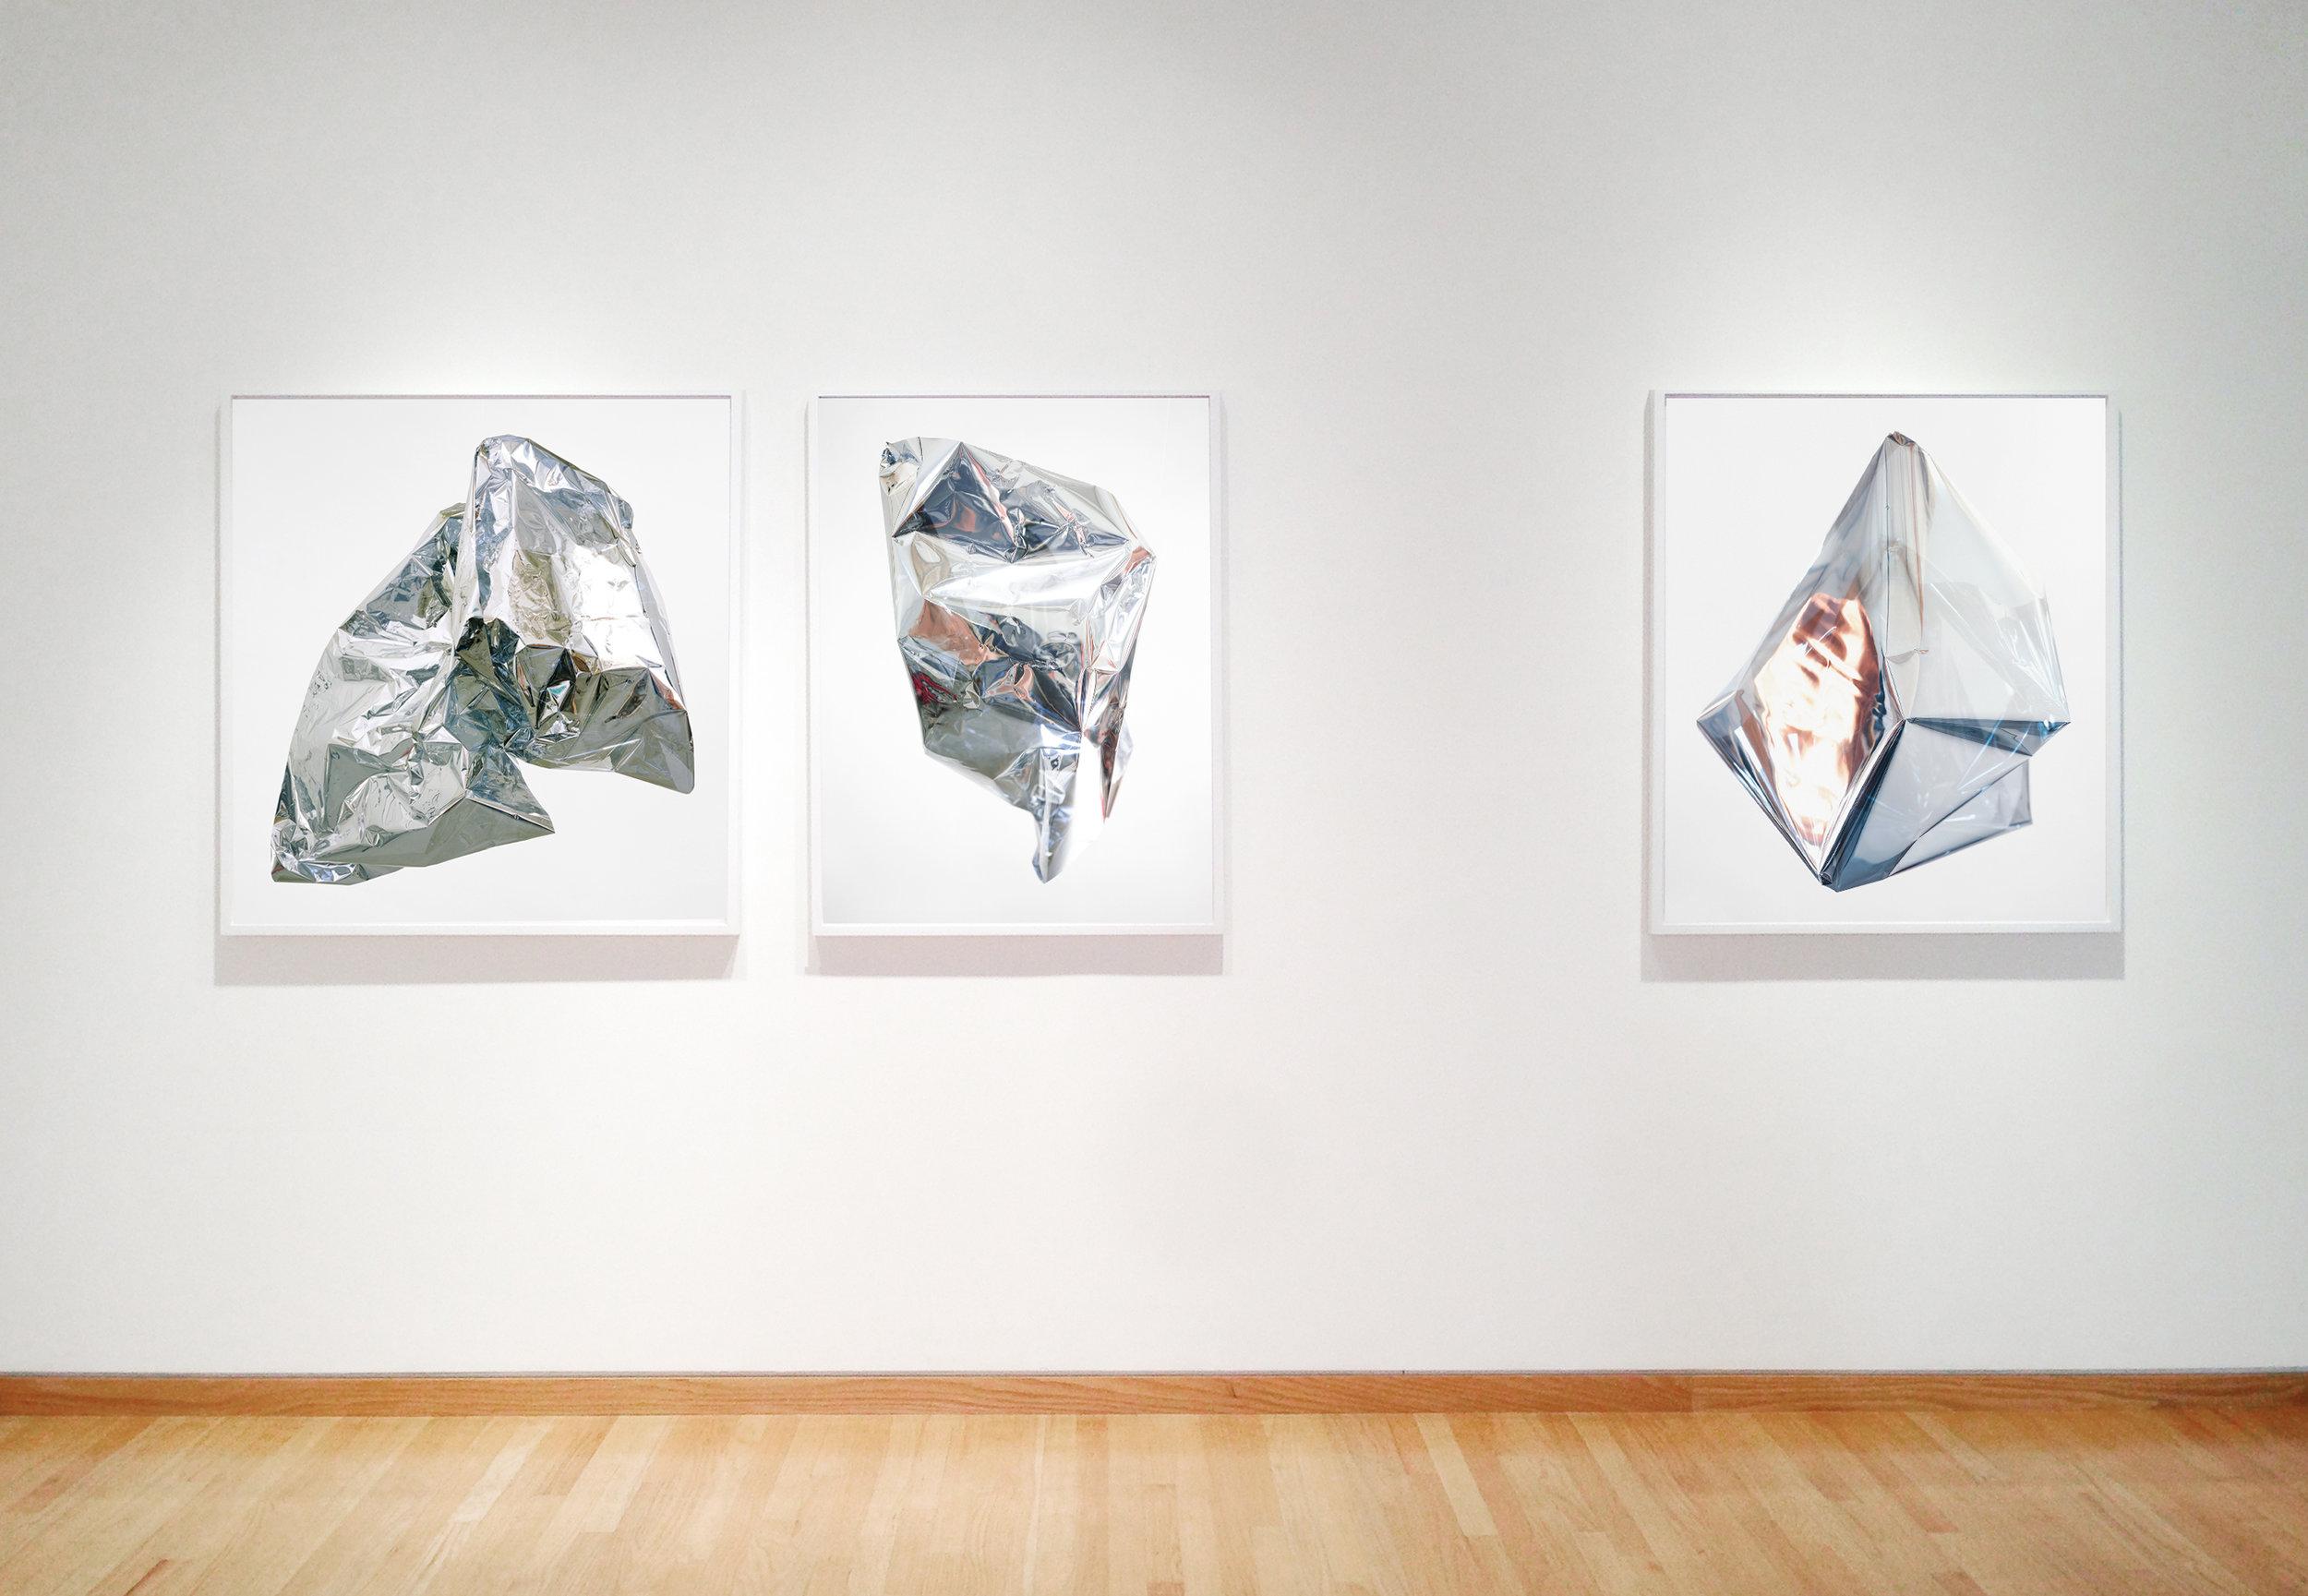 Installation view, Luminous at Stephen Wirtz Gallery 2013